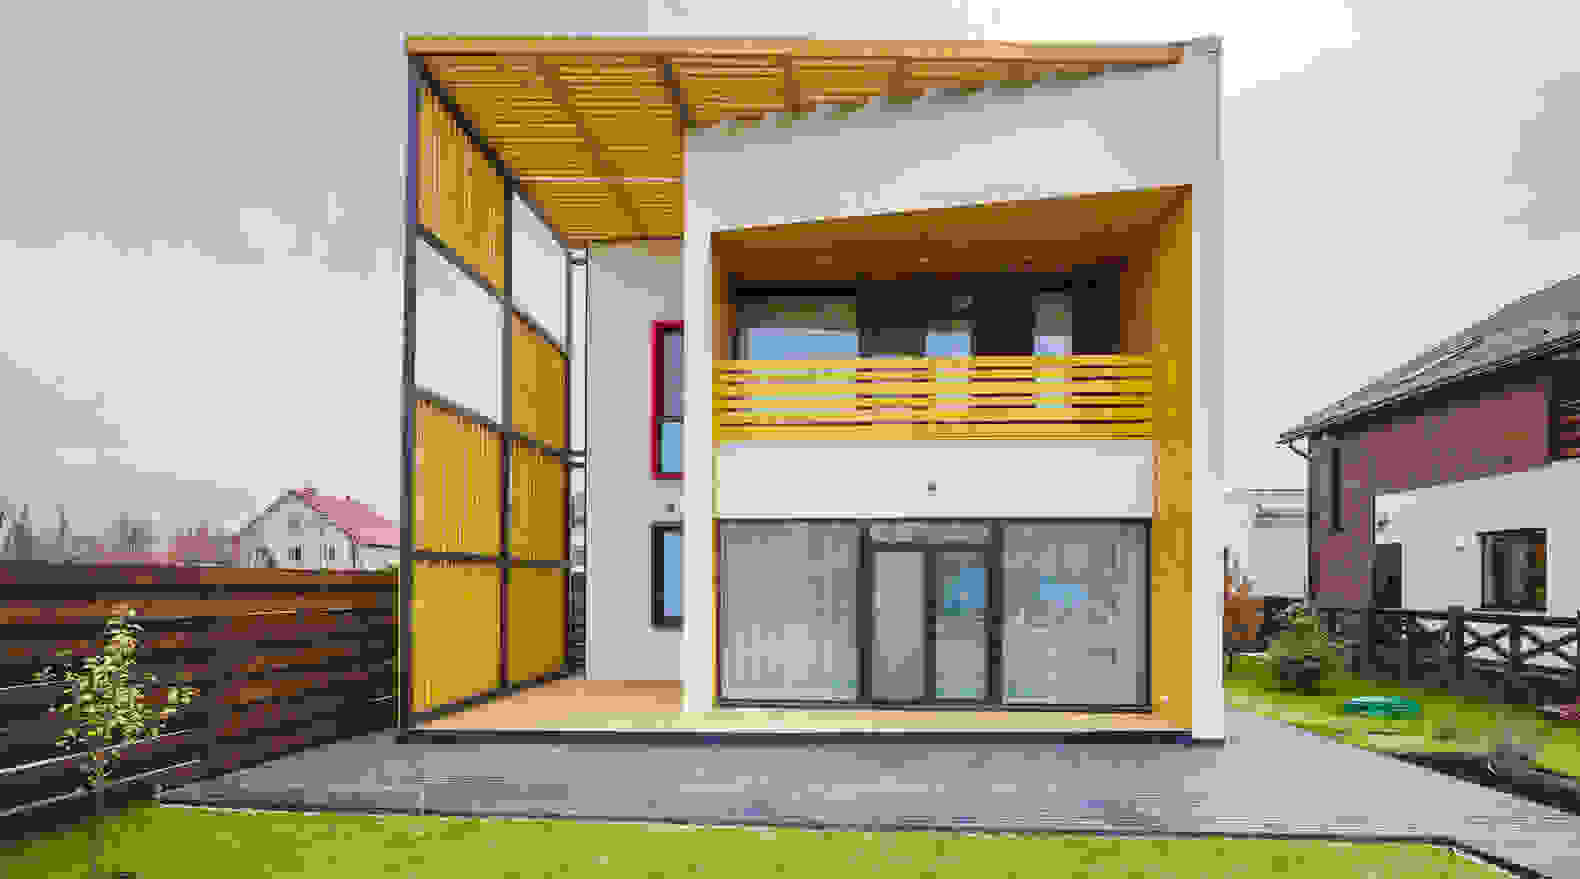 De Stjil-inspired home in Kiev by Workshop Dmitriy Grynevich | Source: grynevich.com